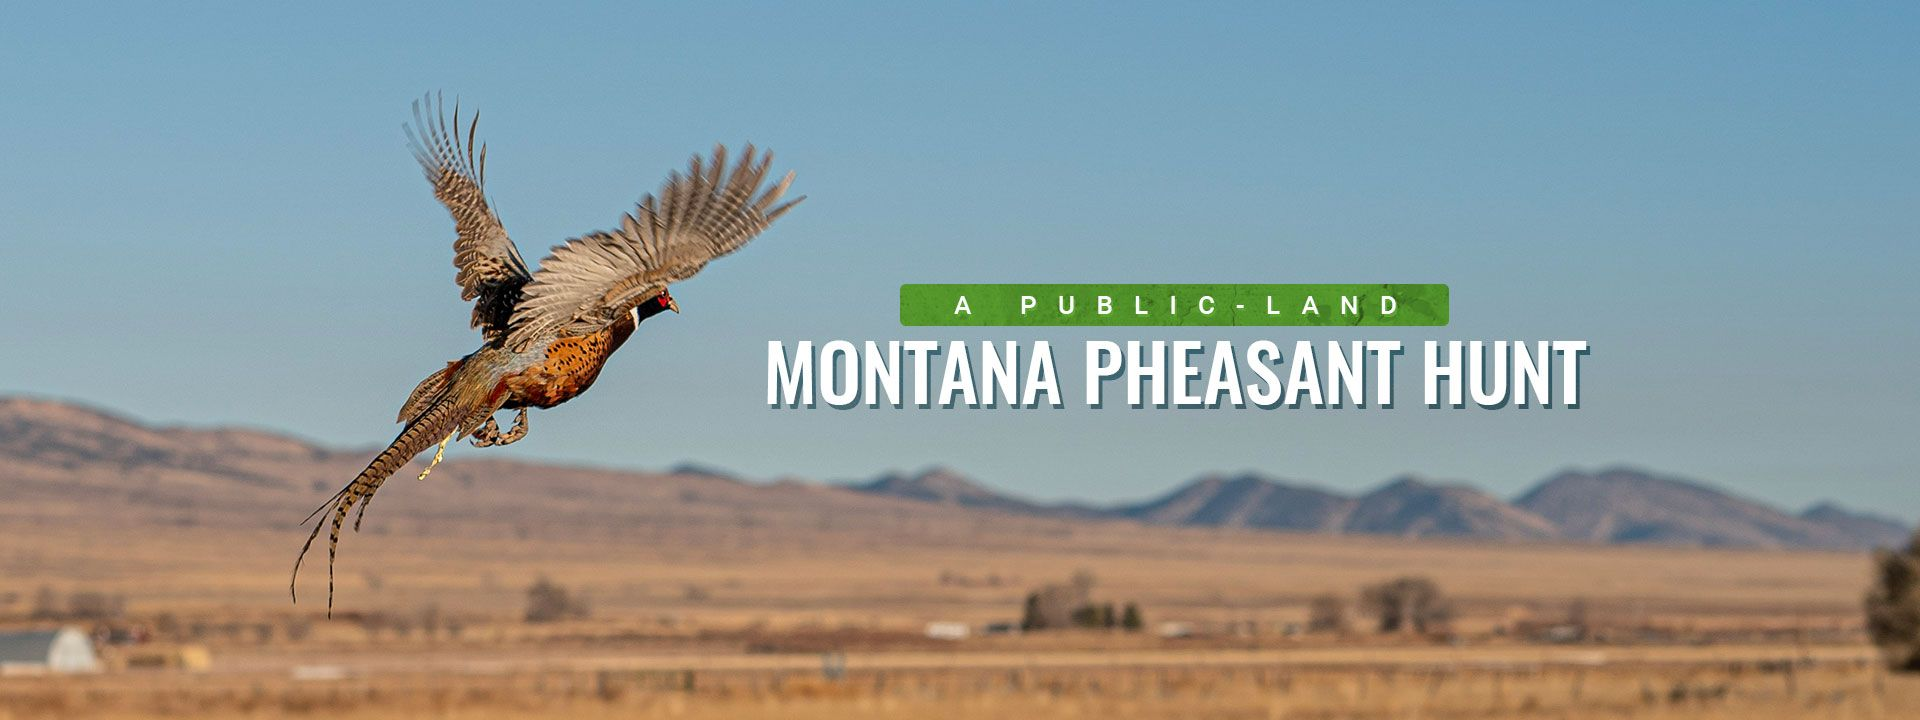 How BaseMap PRO Saved a Public Land Montana Pheasant Hunt